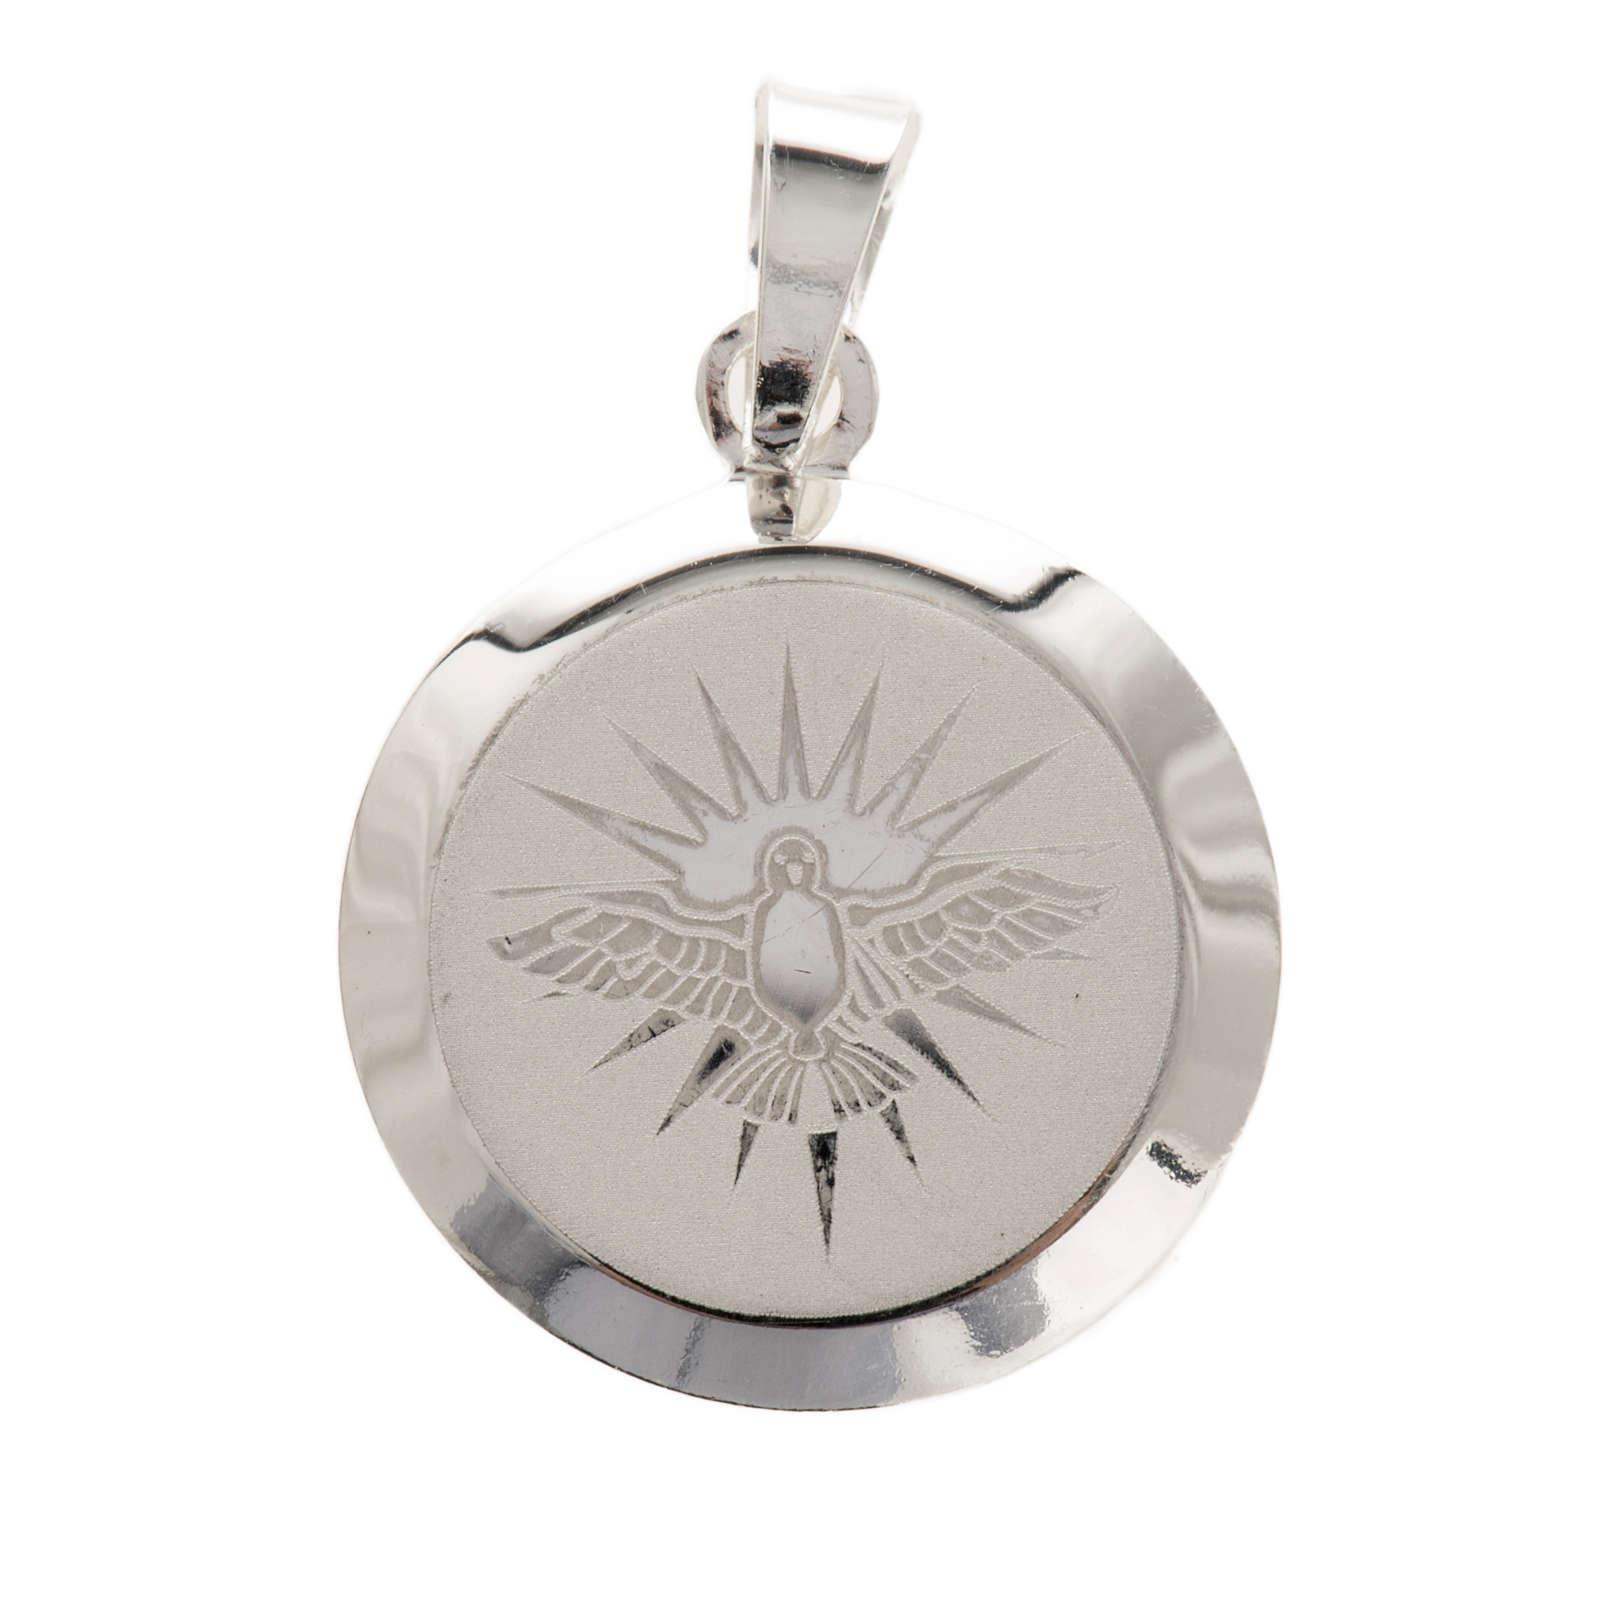 Medalla de Plata 925 del Espíritu Santo 4